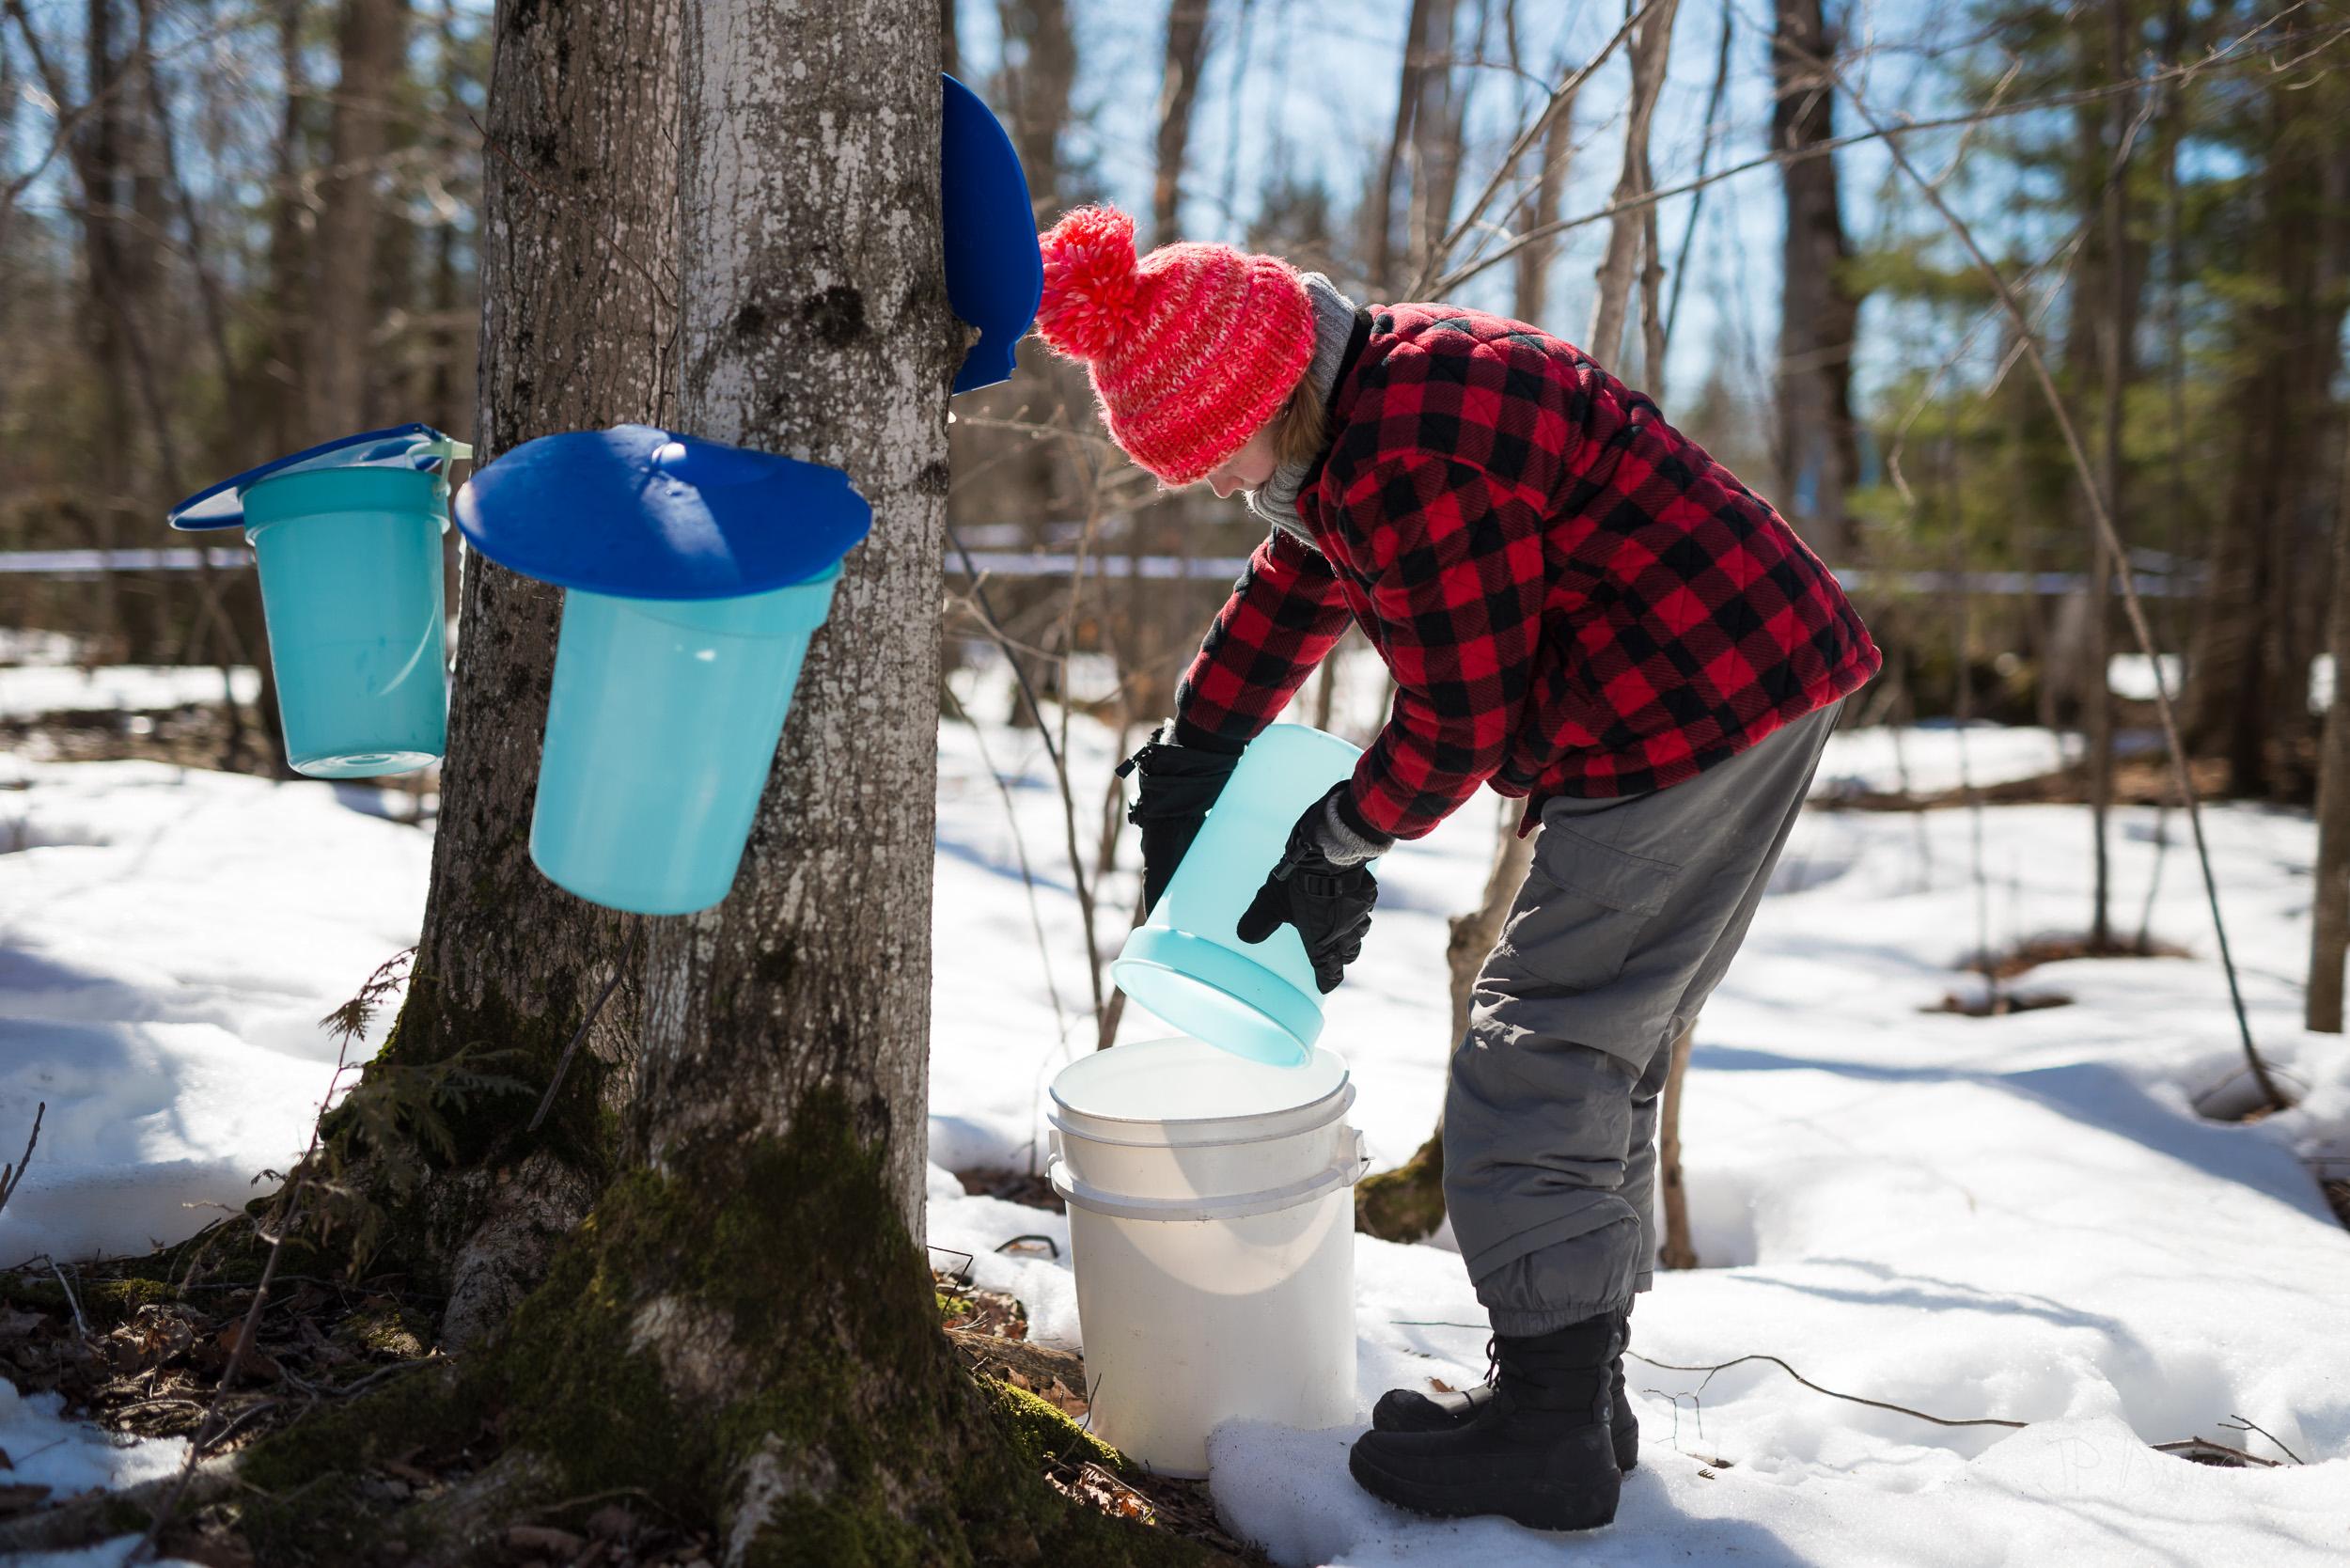 447965b2417 Spring Maple Syrup Making at a Family Maple Sugar Bush - blurMEDIA ...